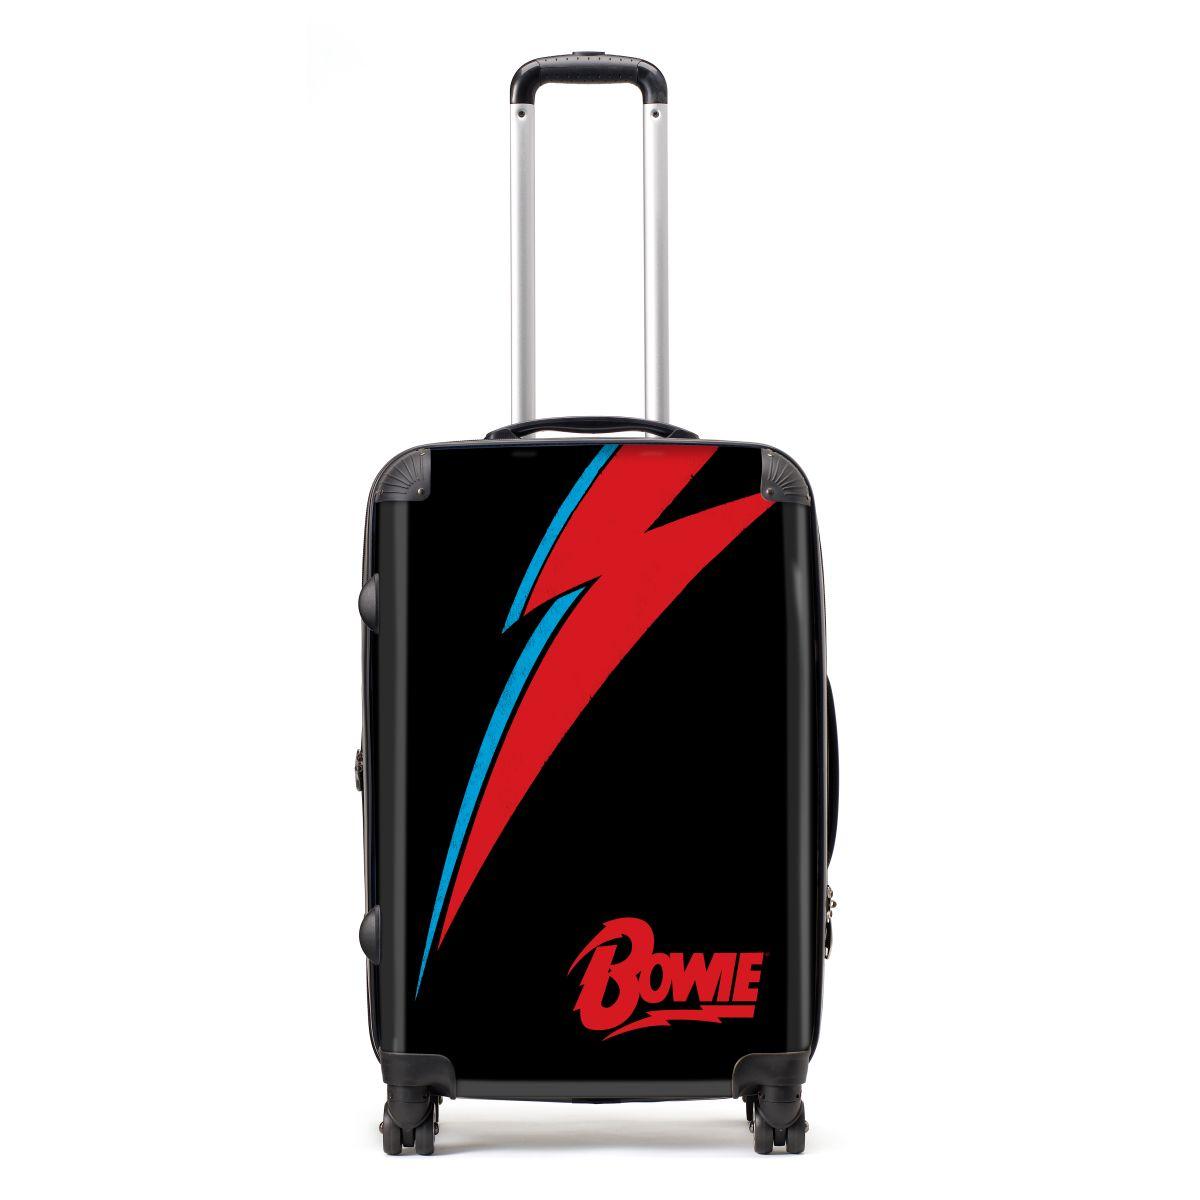 David Bowie Lightning Luggage